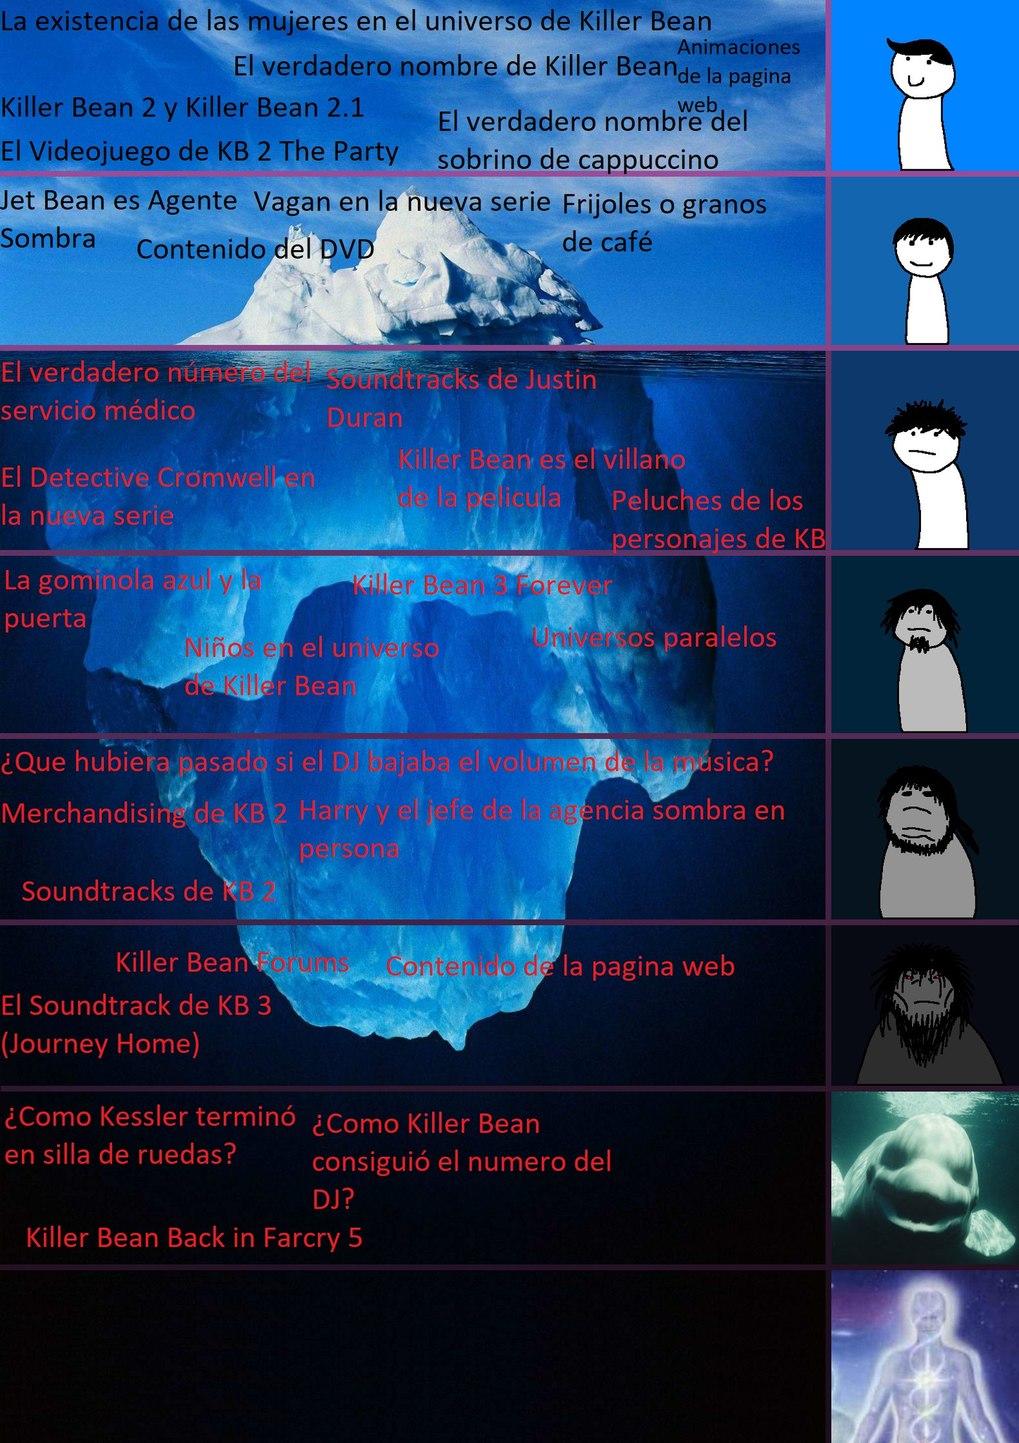 El Iceberg de Killer Bean - meme